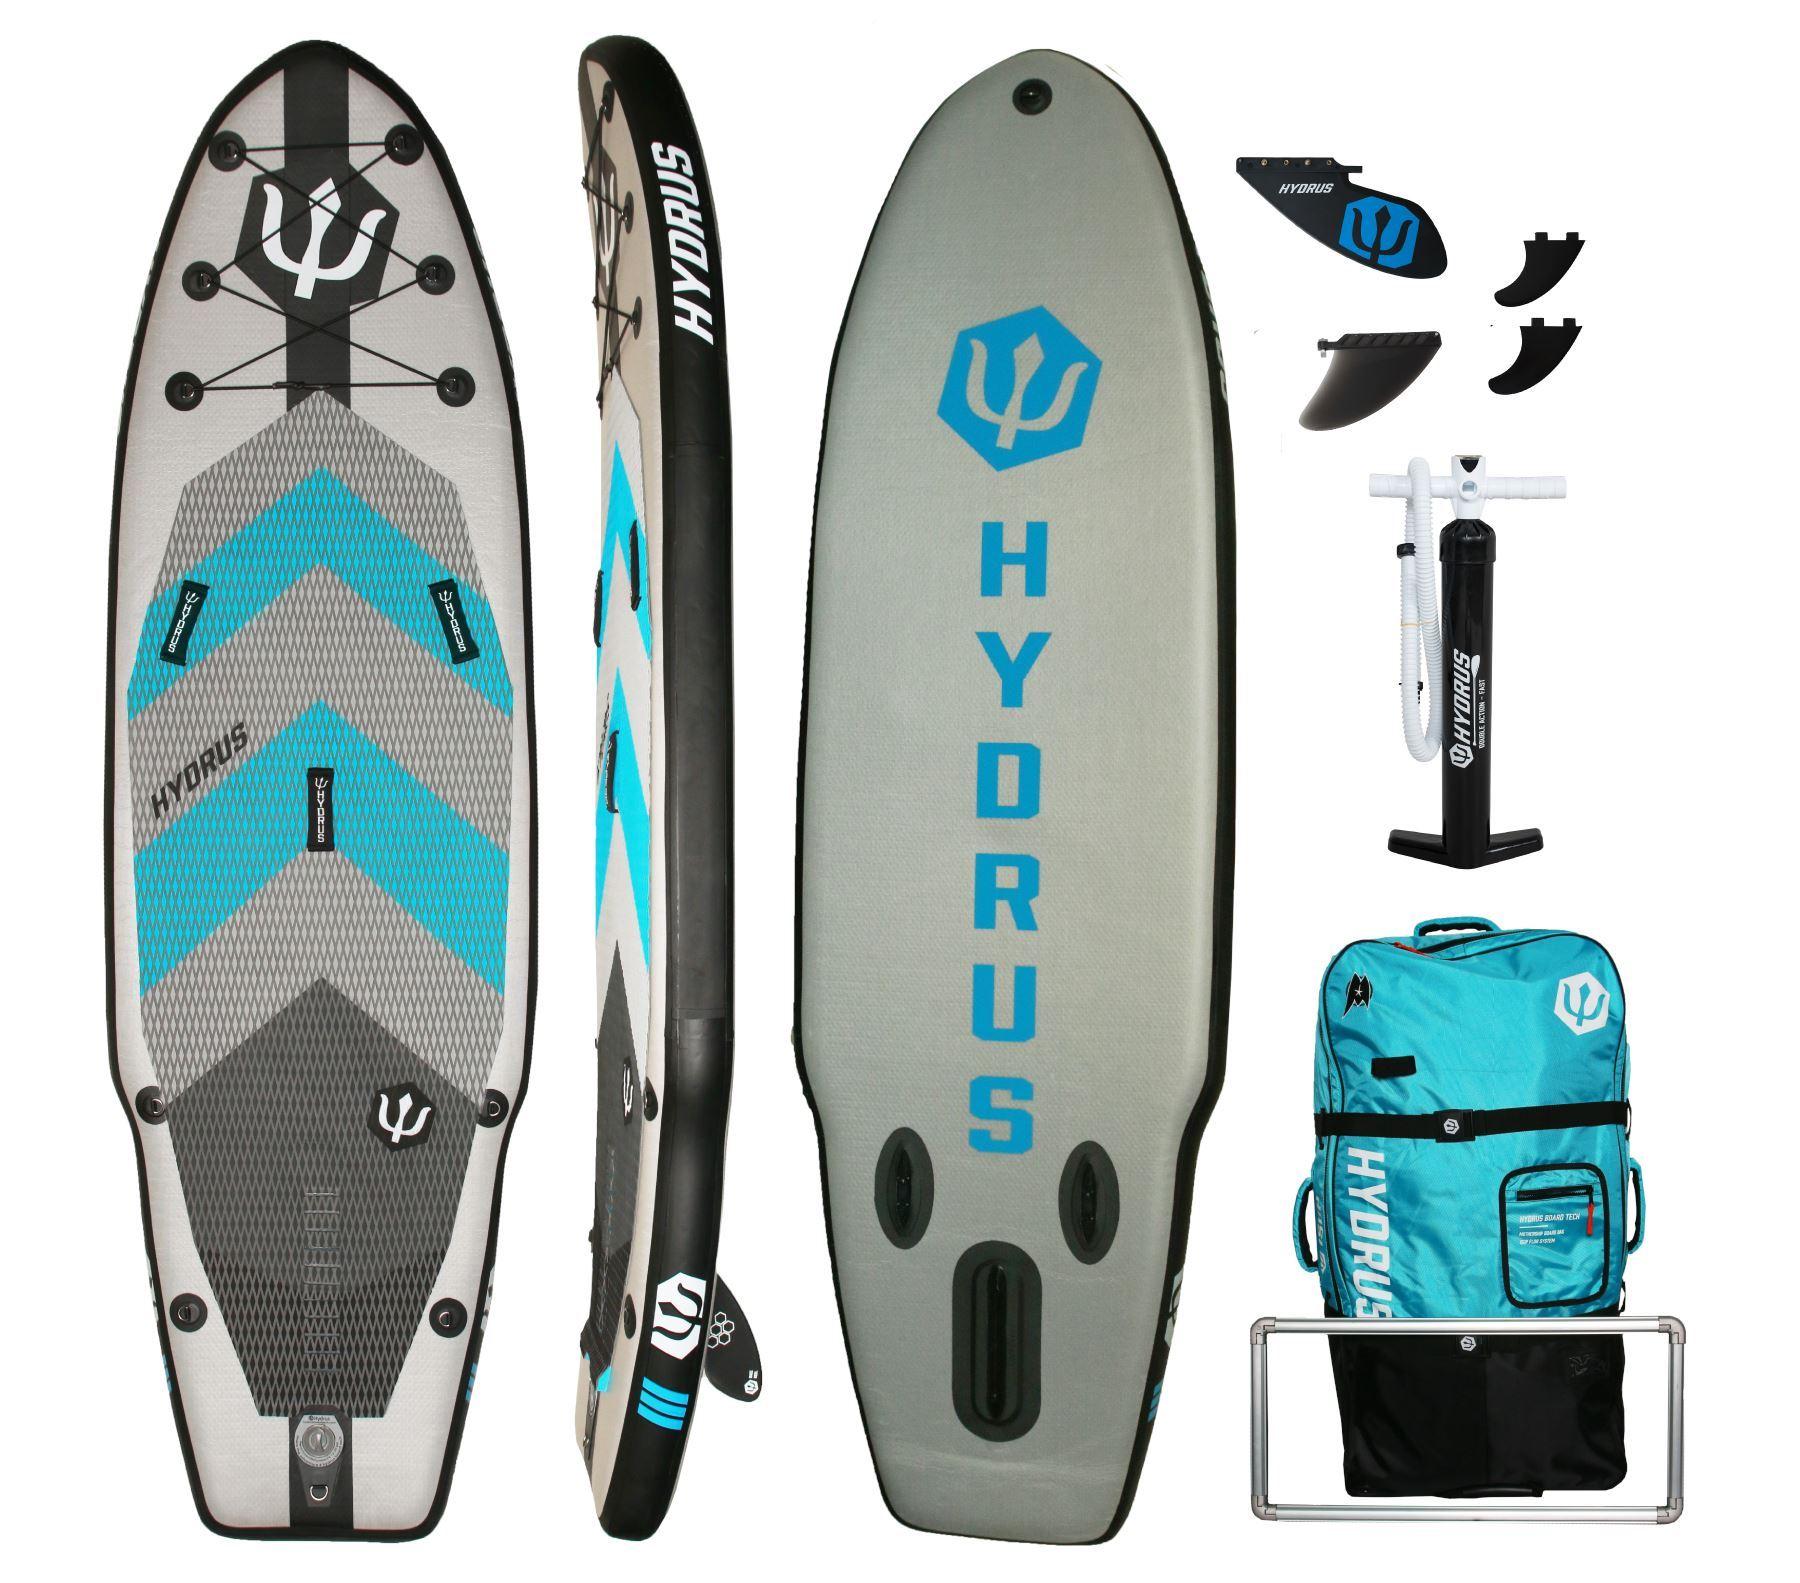 inflatable-king-idub-10x35-hydrus-board-tech-715189